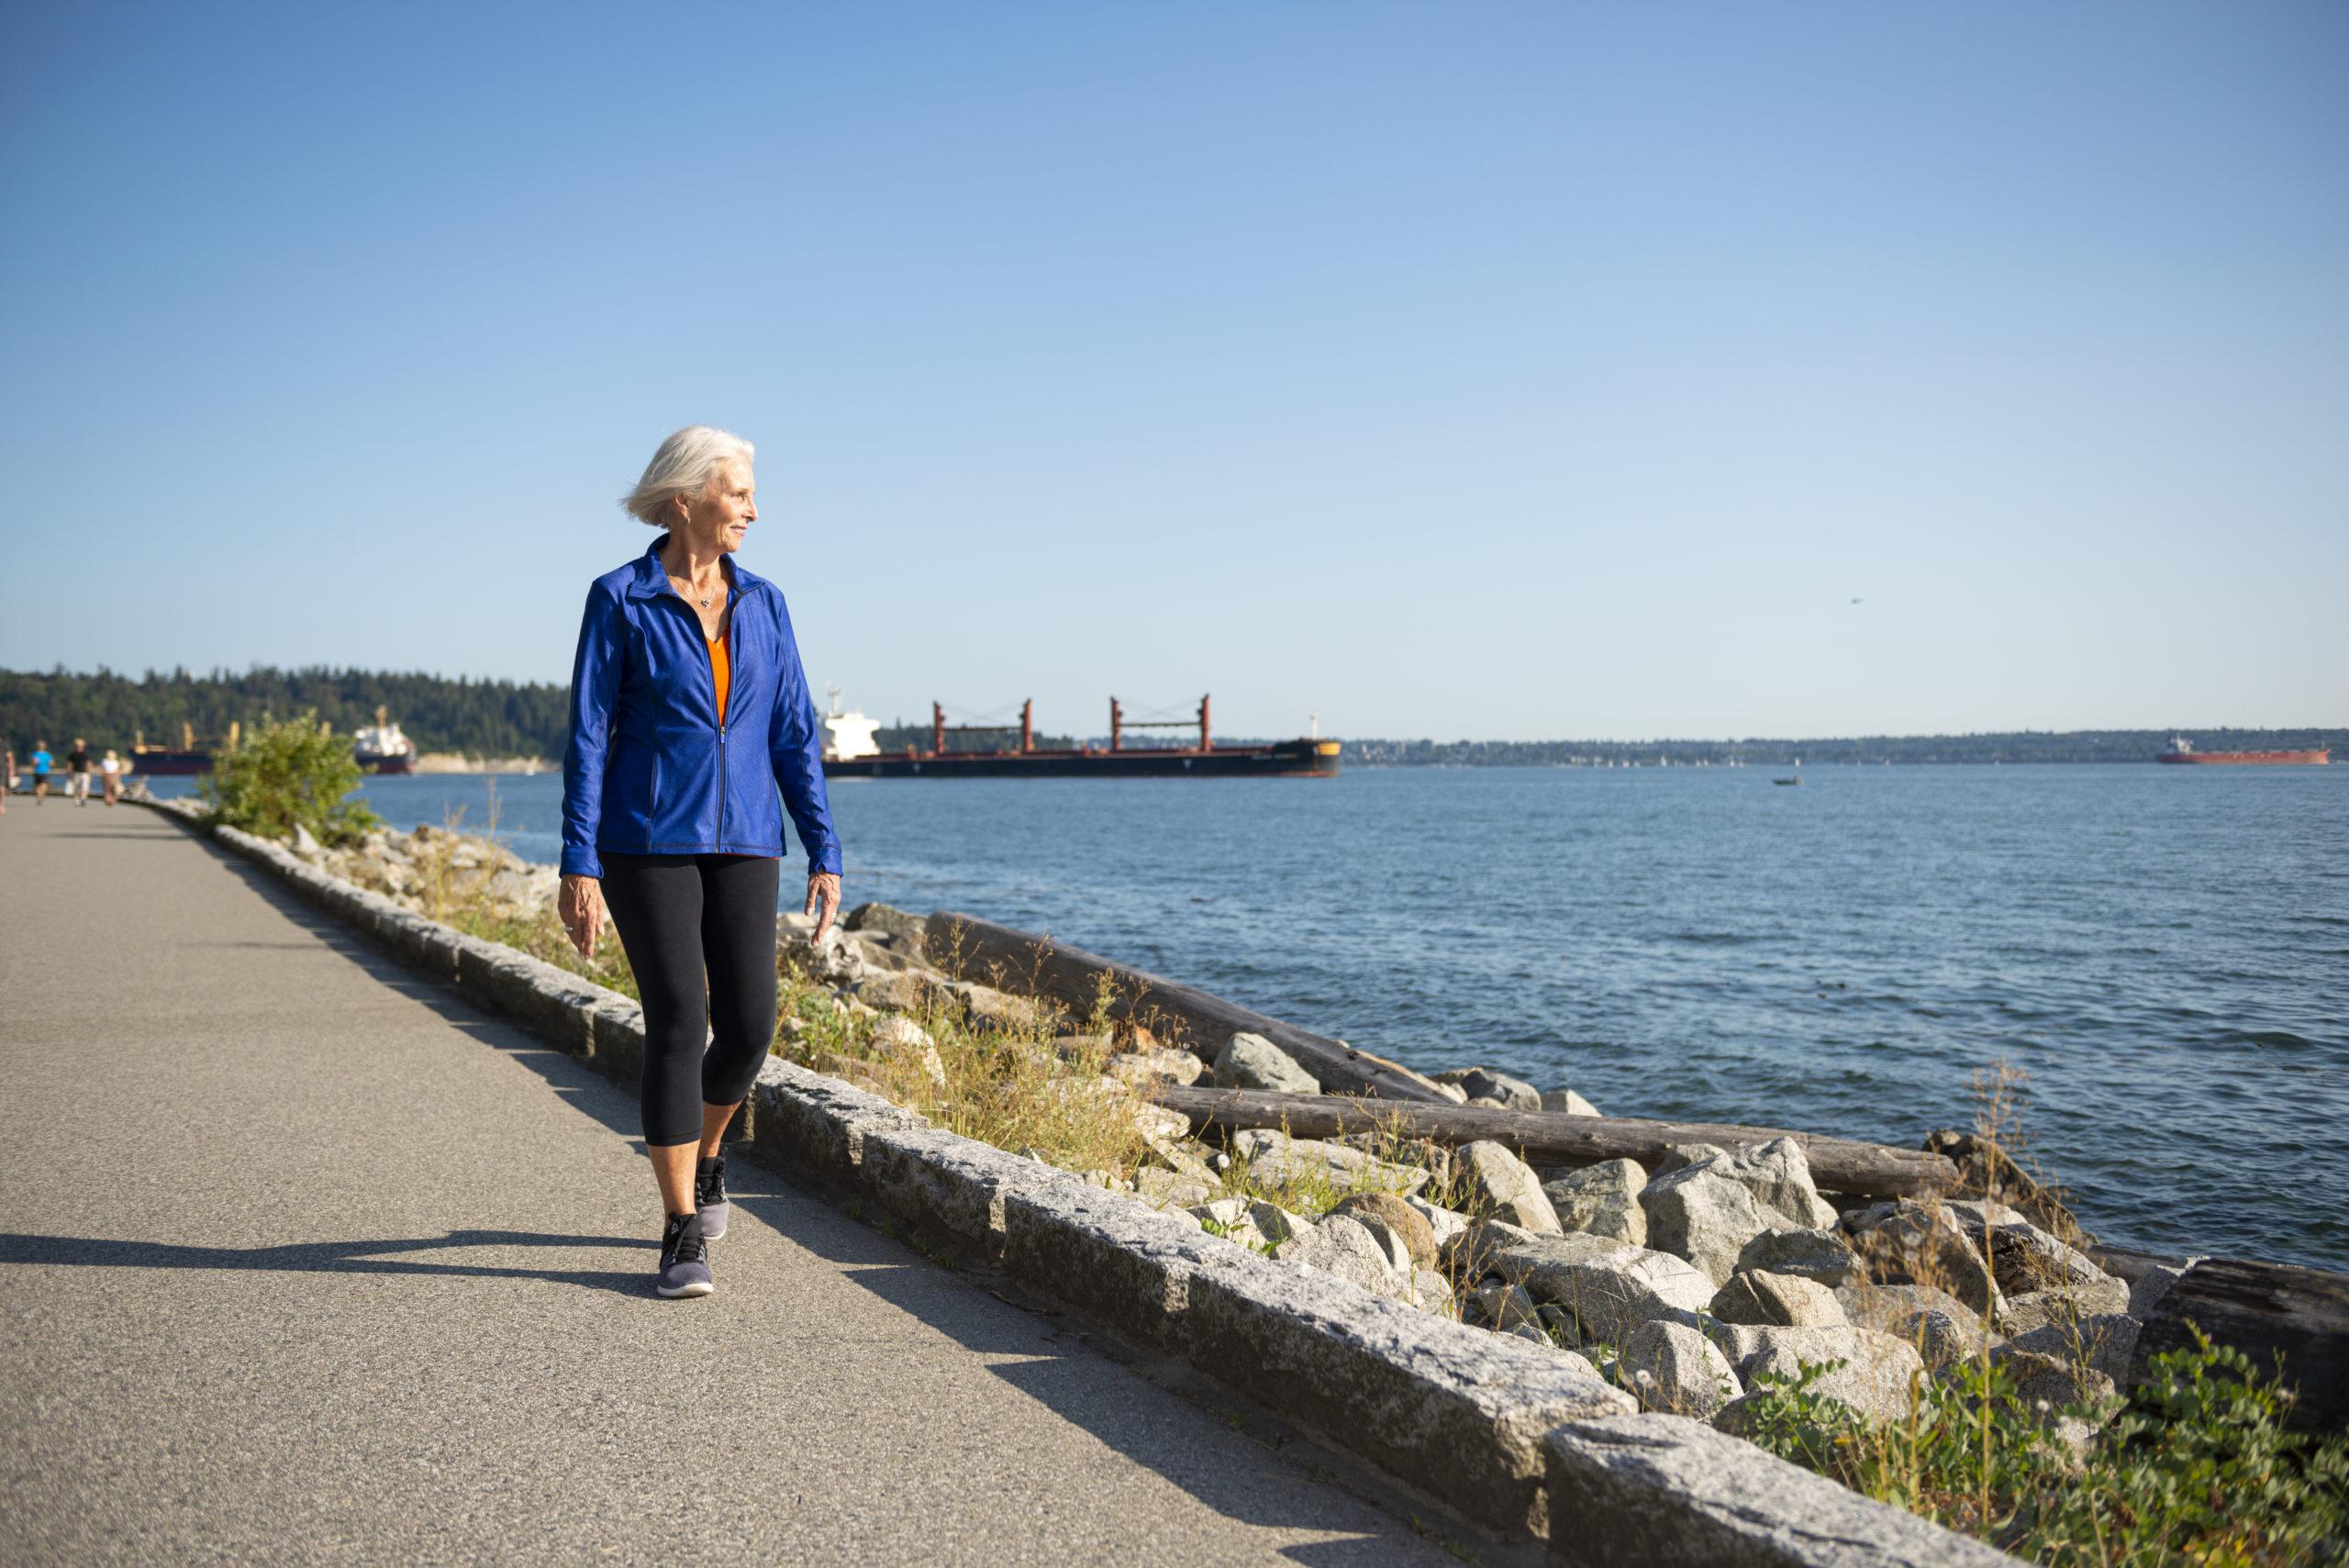 Senior woman walking along seawall